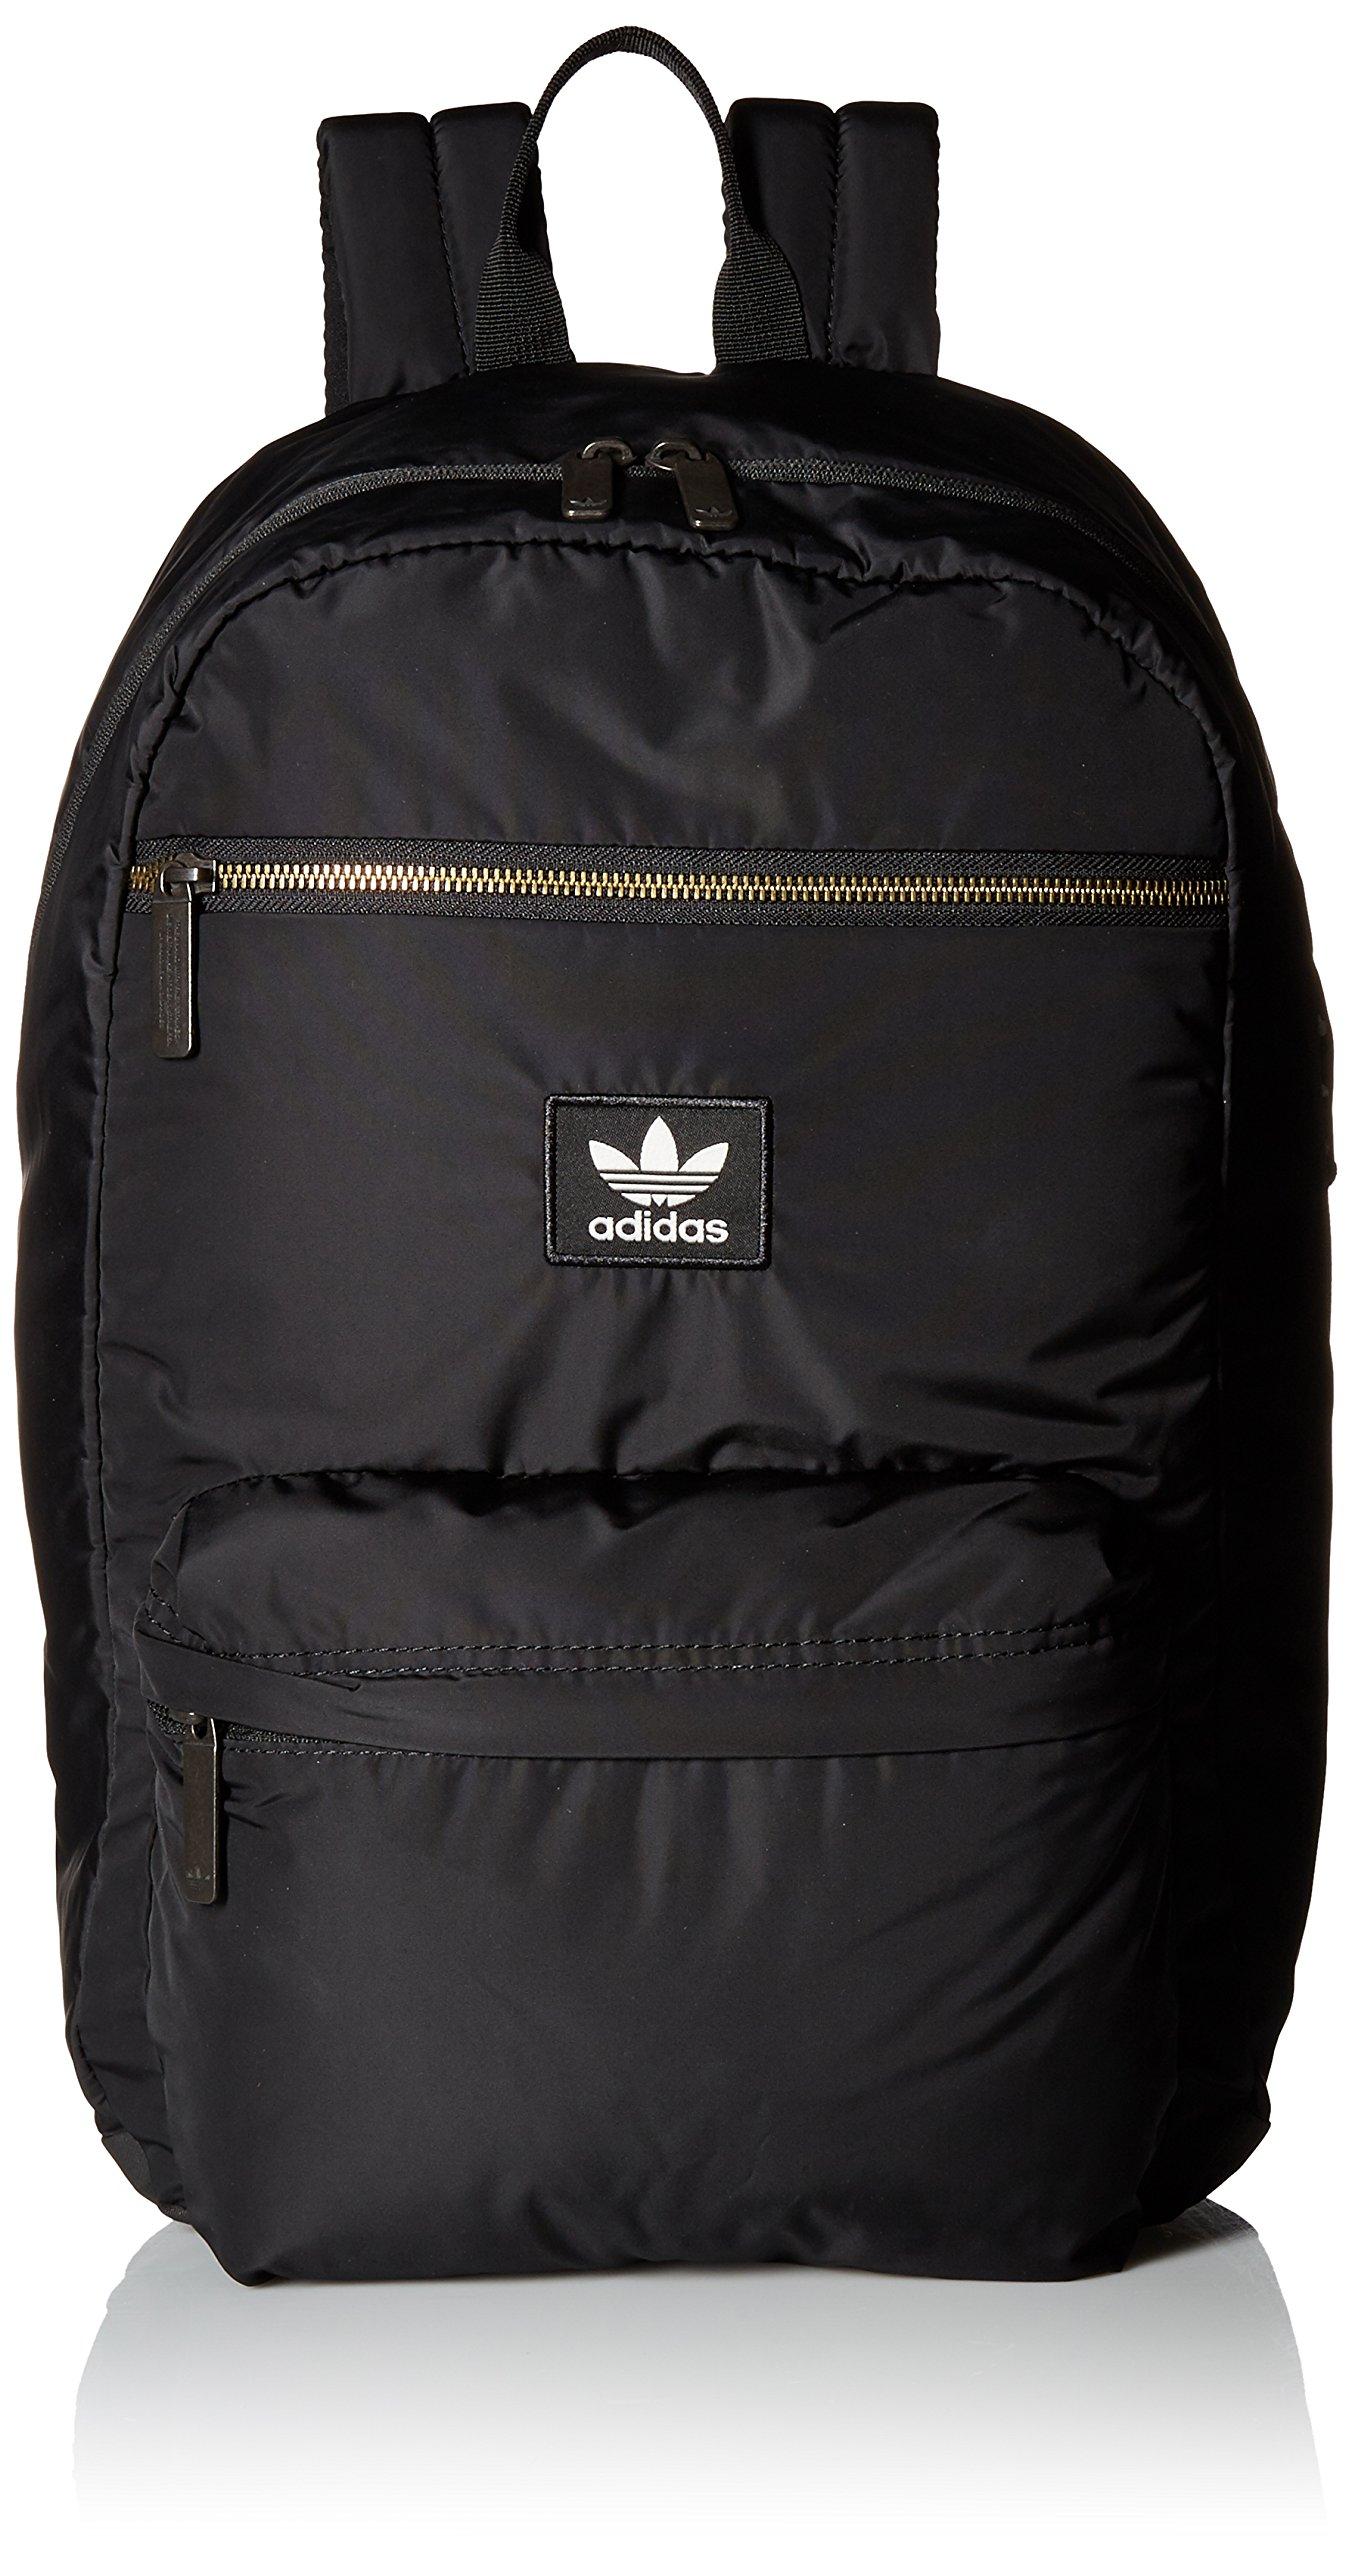 adidas Originals National Plus Backpack, Black, One Size